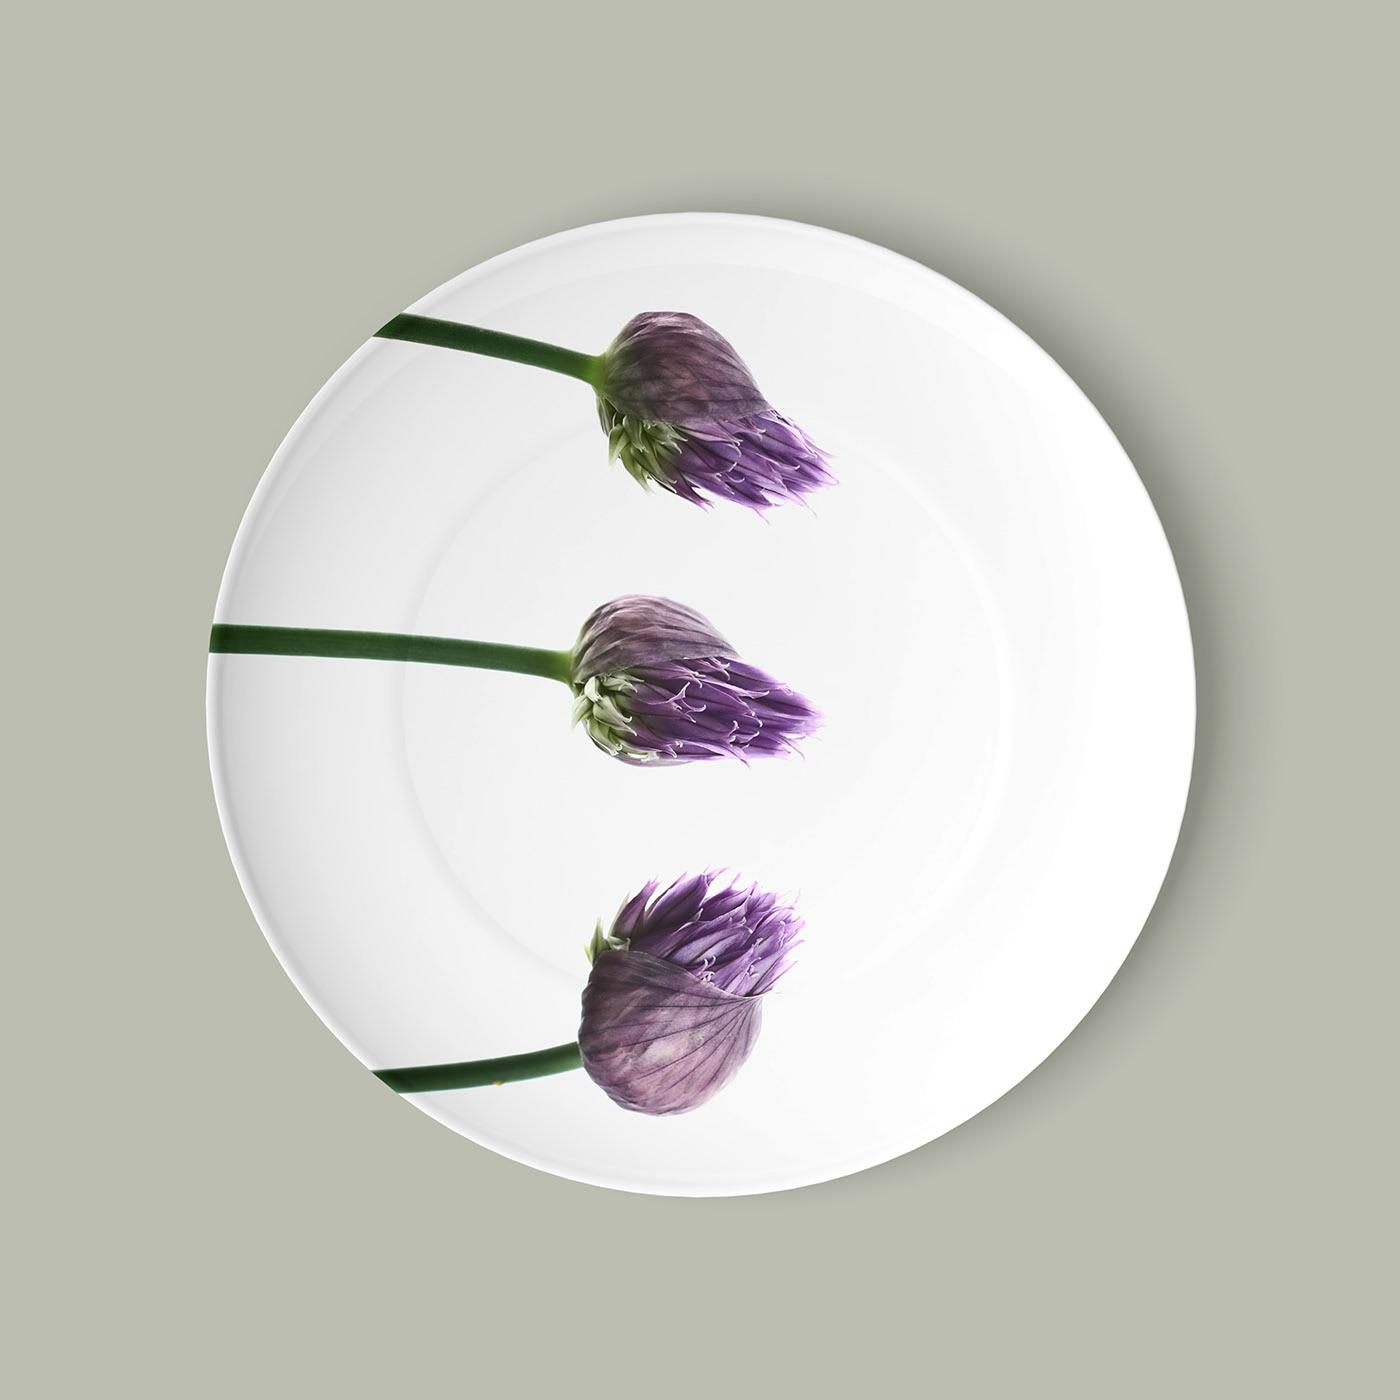 Plates / фотограф Bettina Güber